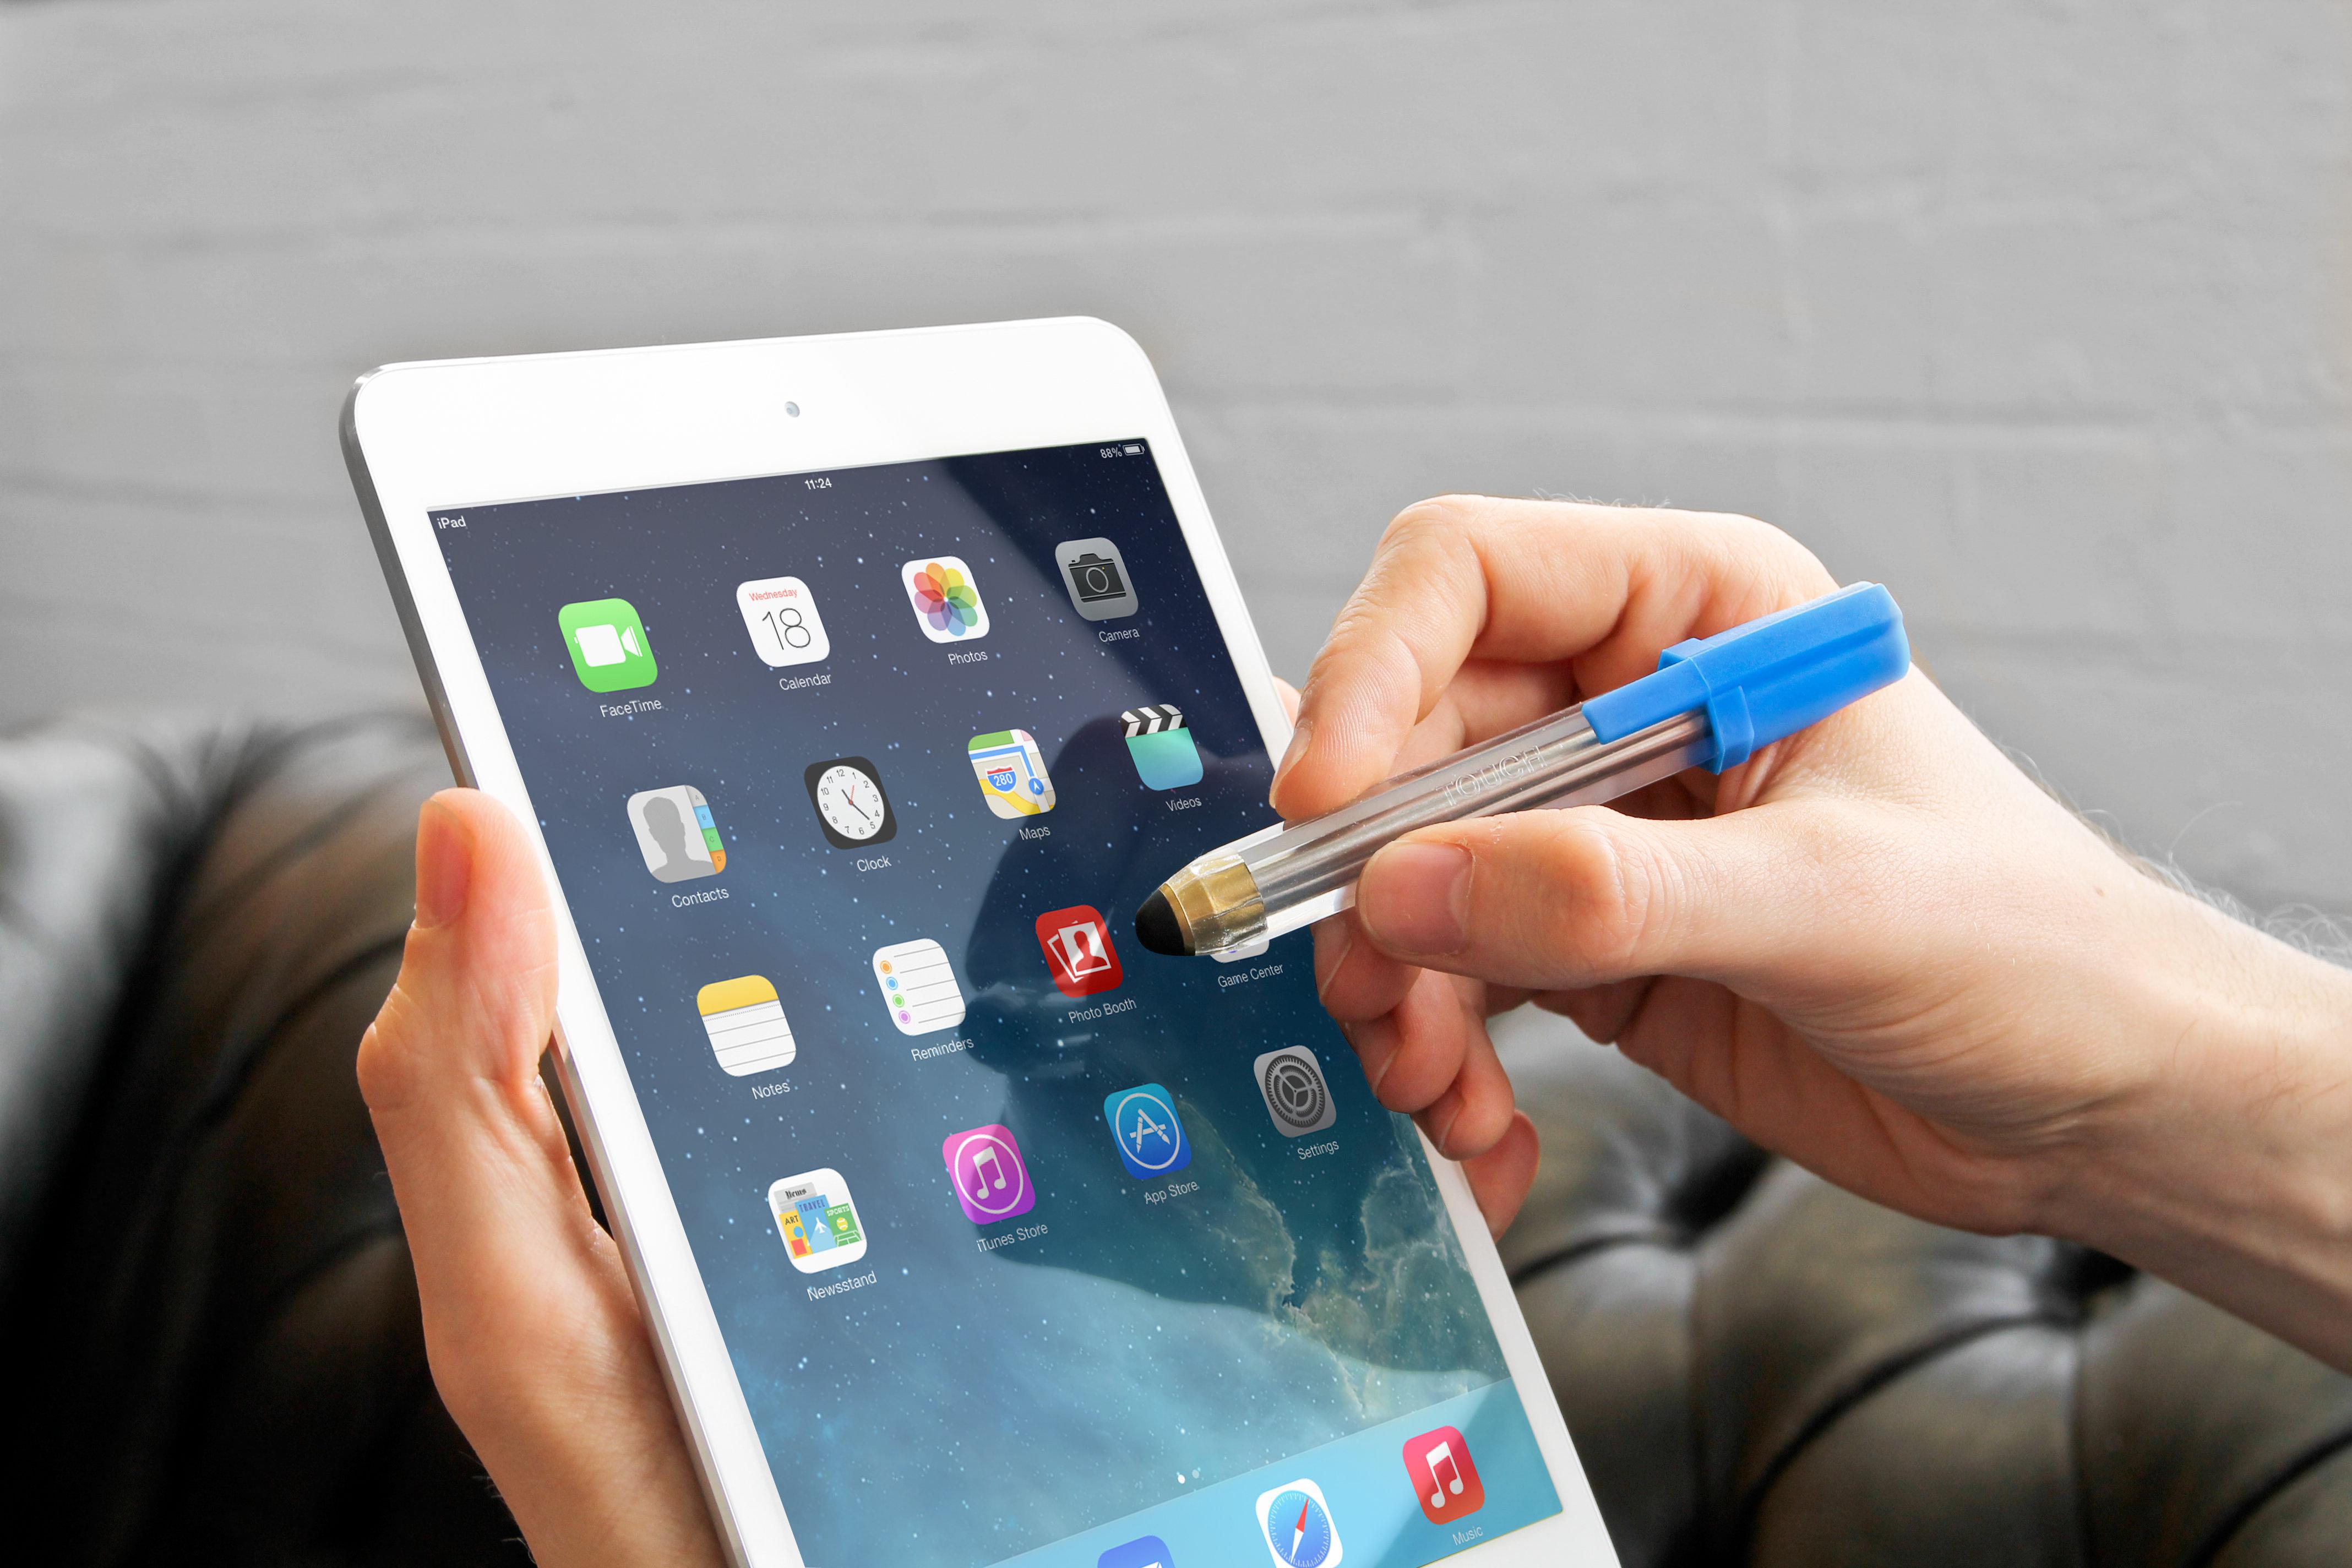 ipad writing pen